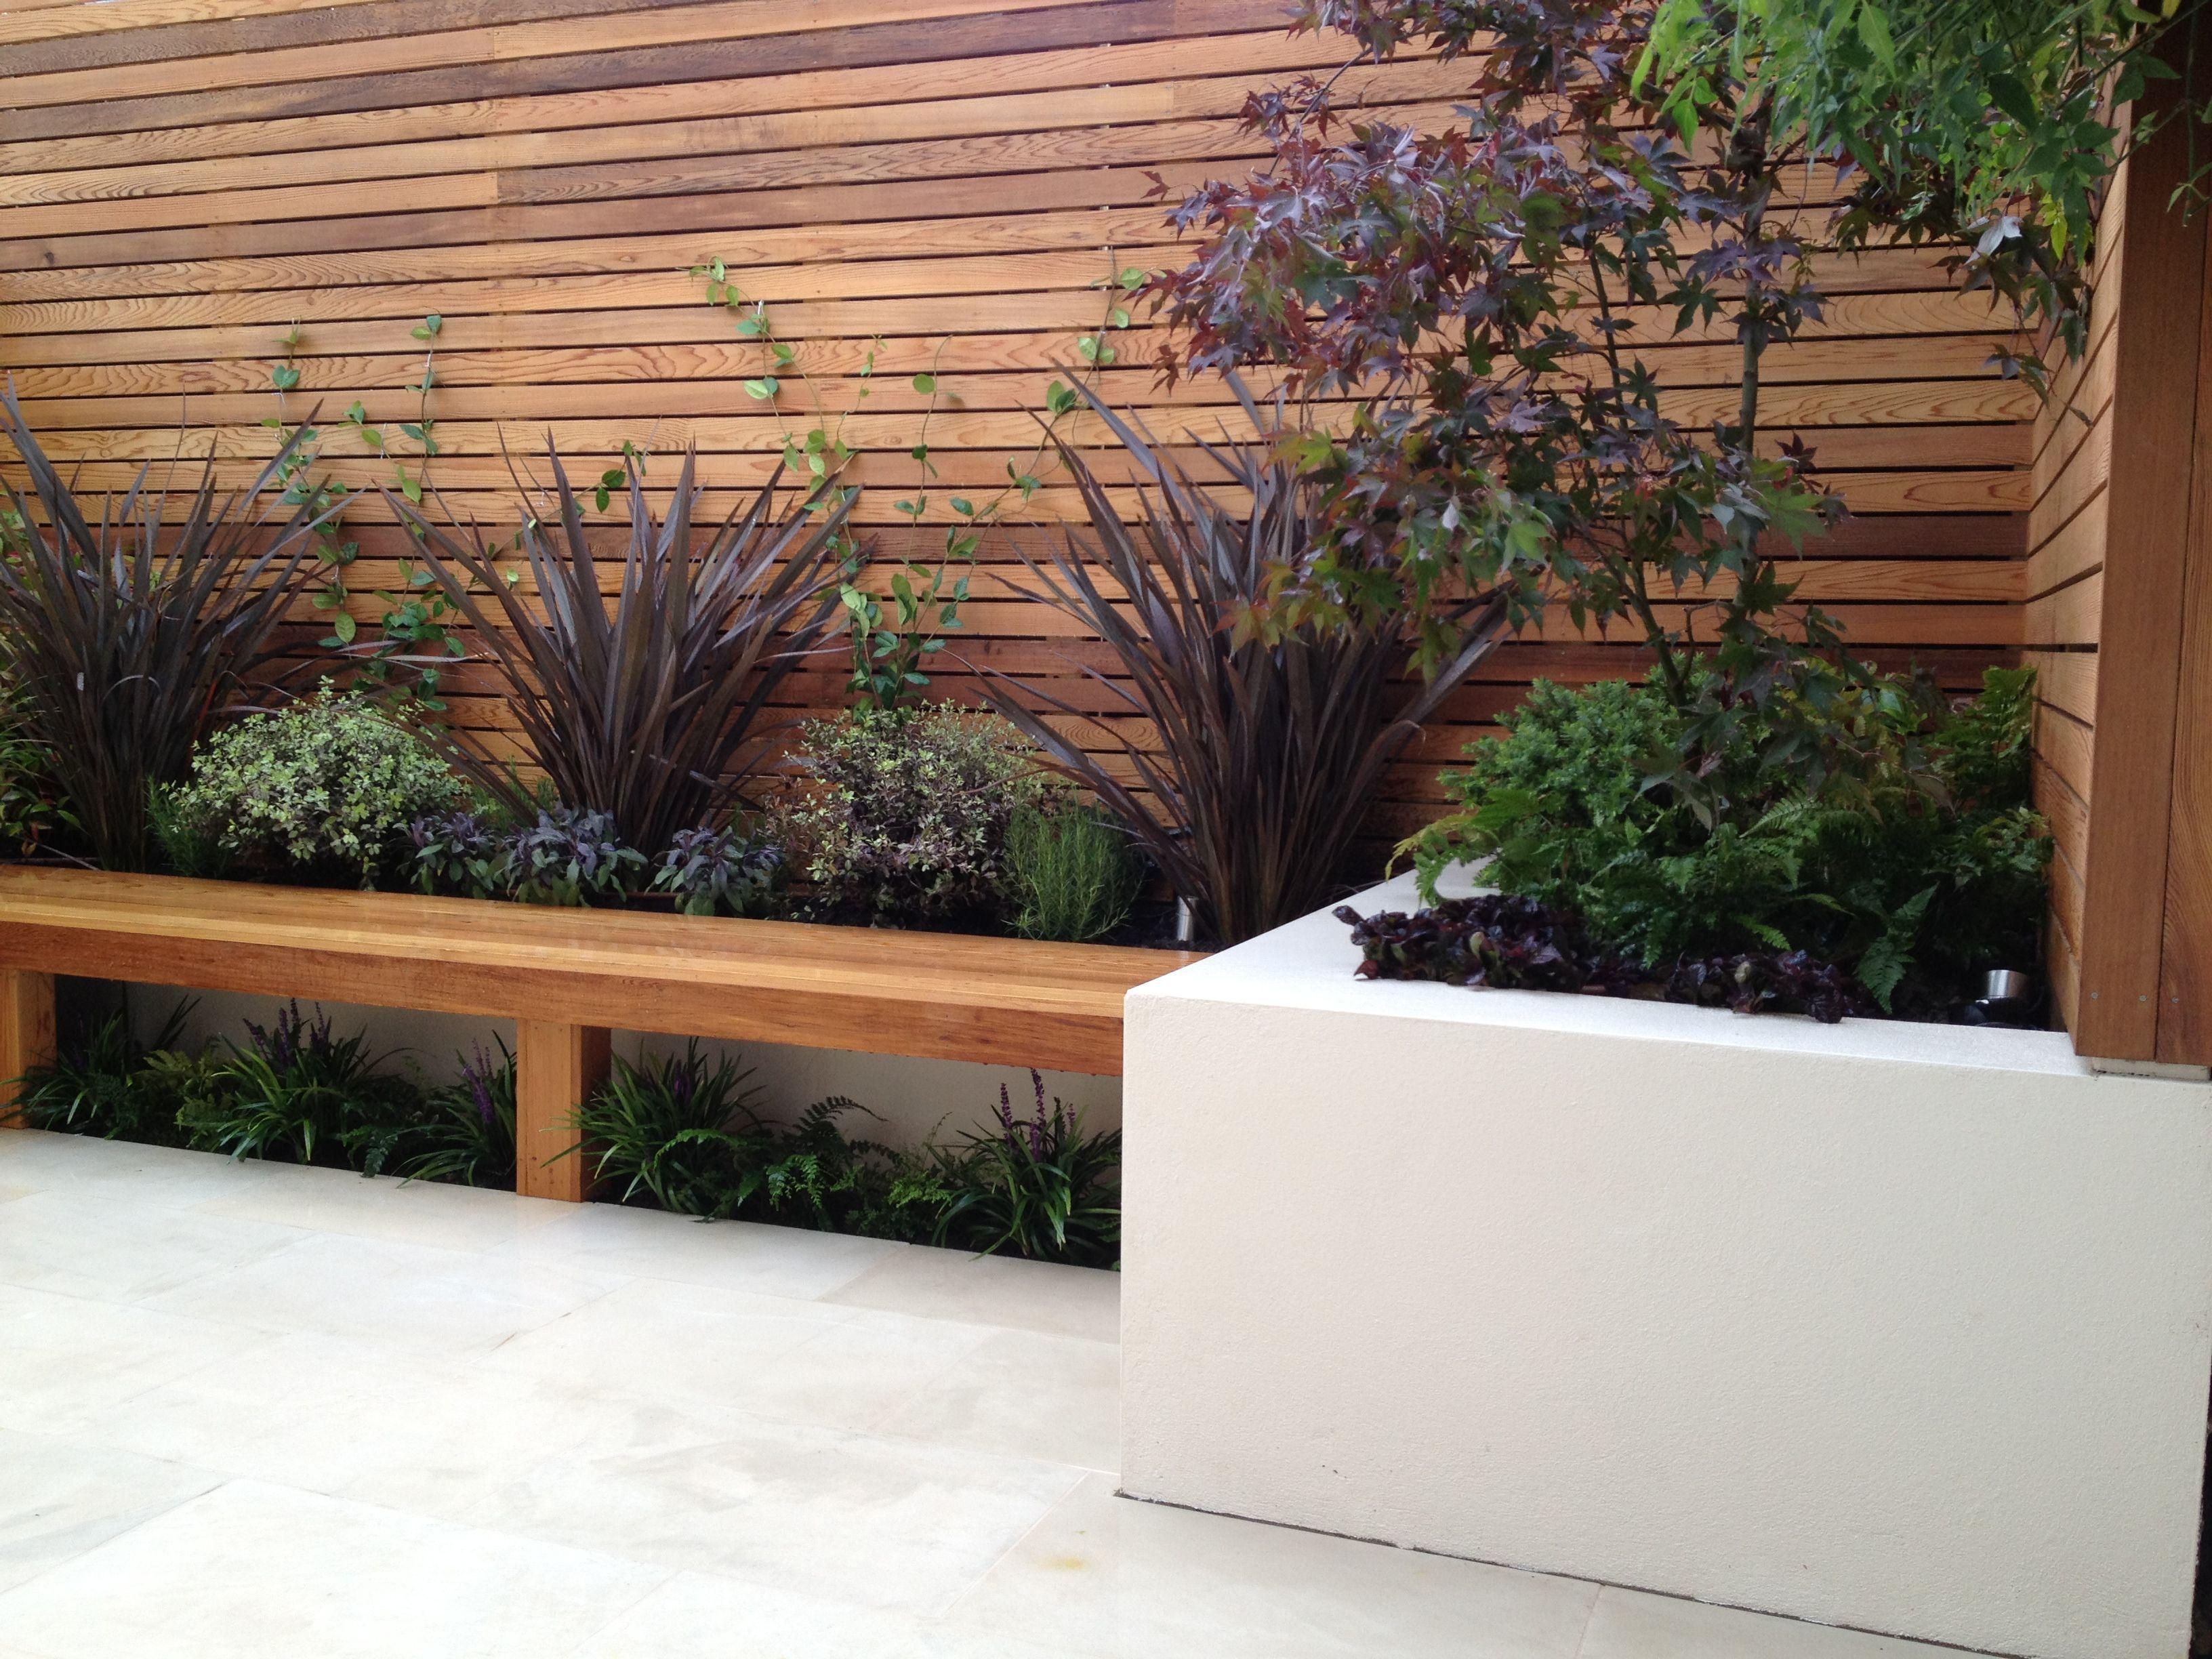 10 Modern Garden Design Ideas Awesome As Well As Stunning Contemporary Garden Design Modern Garden Design Urban Garden Design